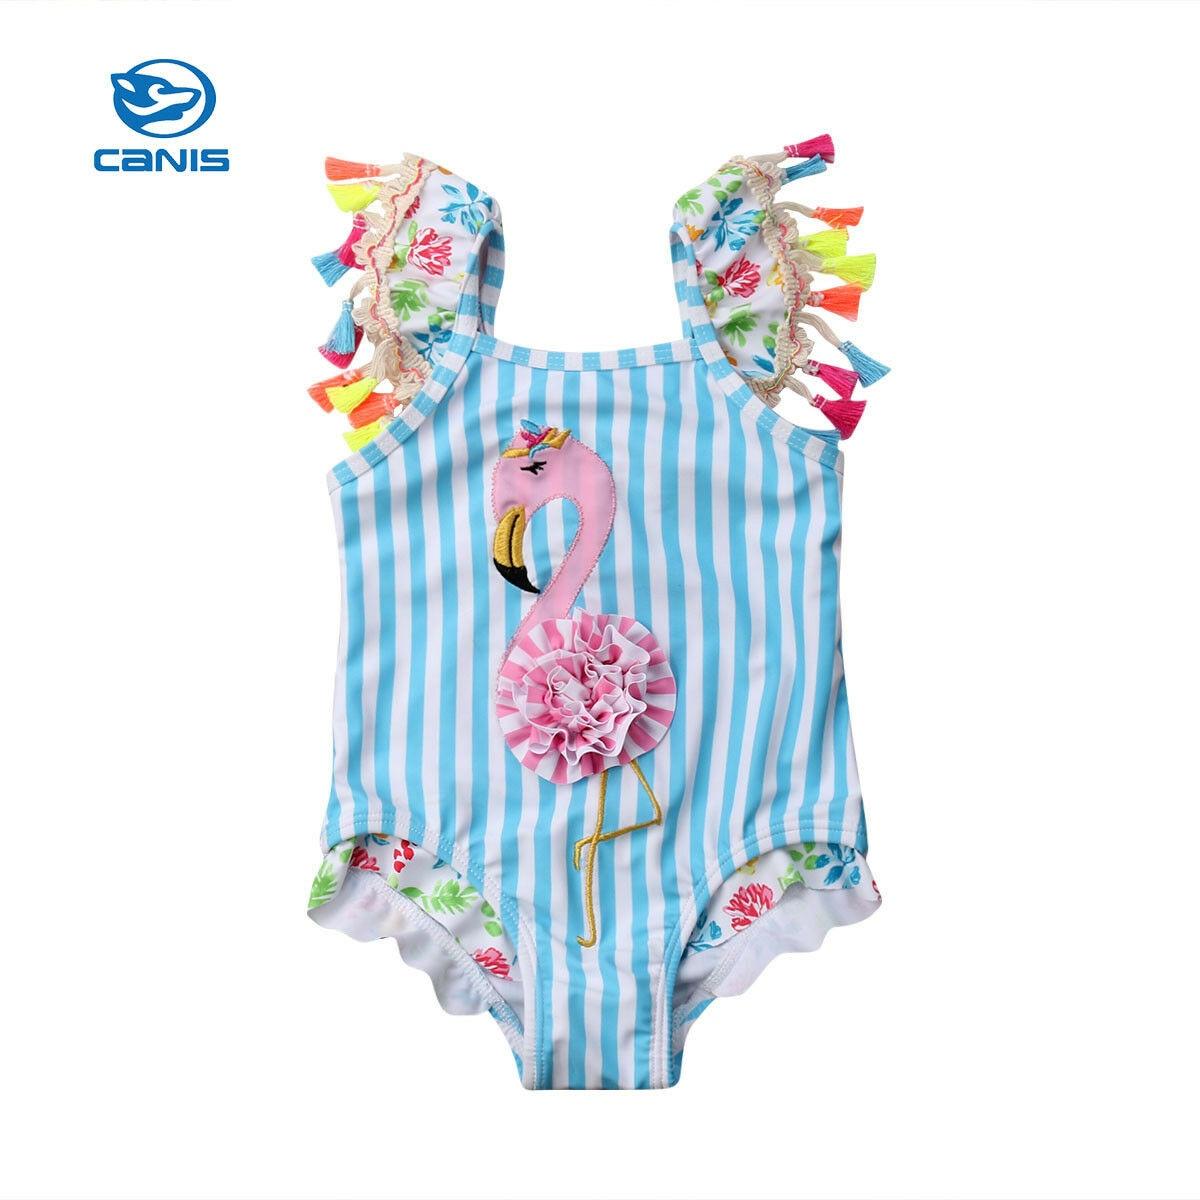 2019 Toddler Kids Baby Girls Flamingo Cartoon Bikini Swimwear Swimsuit Bathing Beach2019 Toddler Kids Baby Girls Flamingo Cartoon Bikini Swimwear Swimsuit Bathing Beach